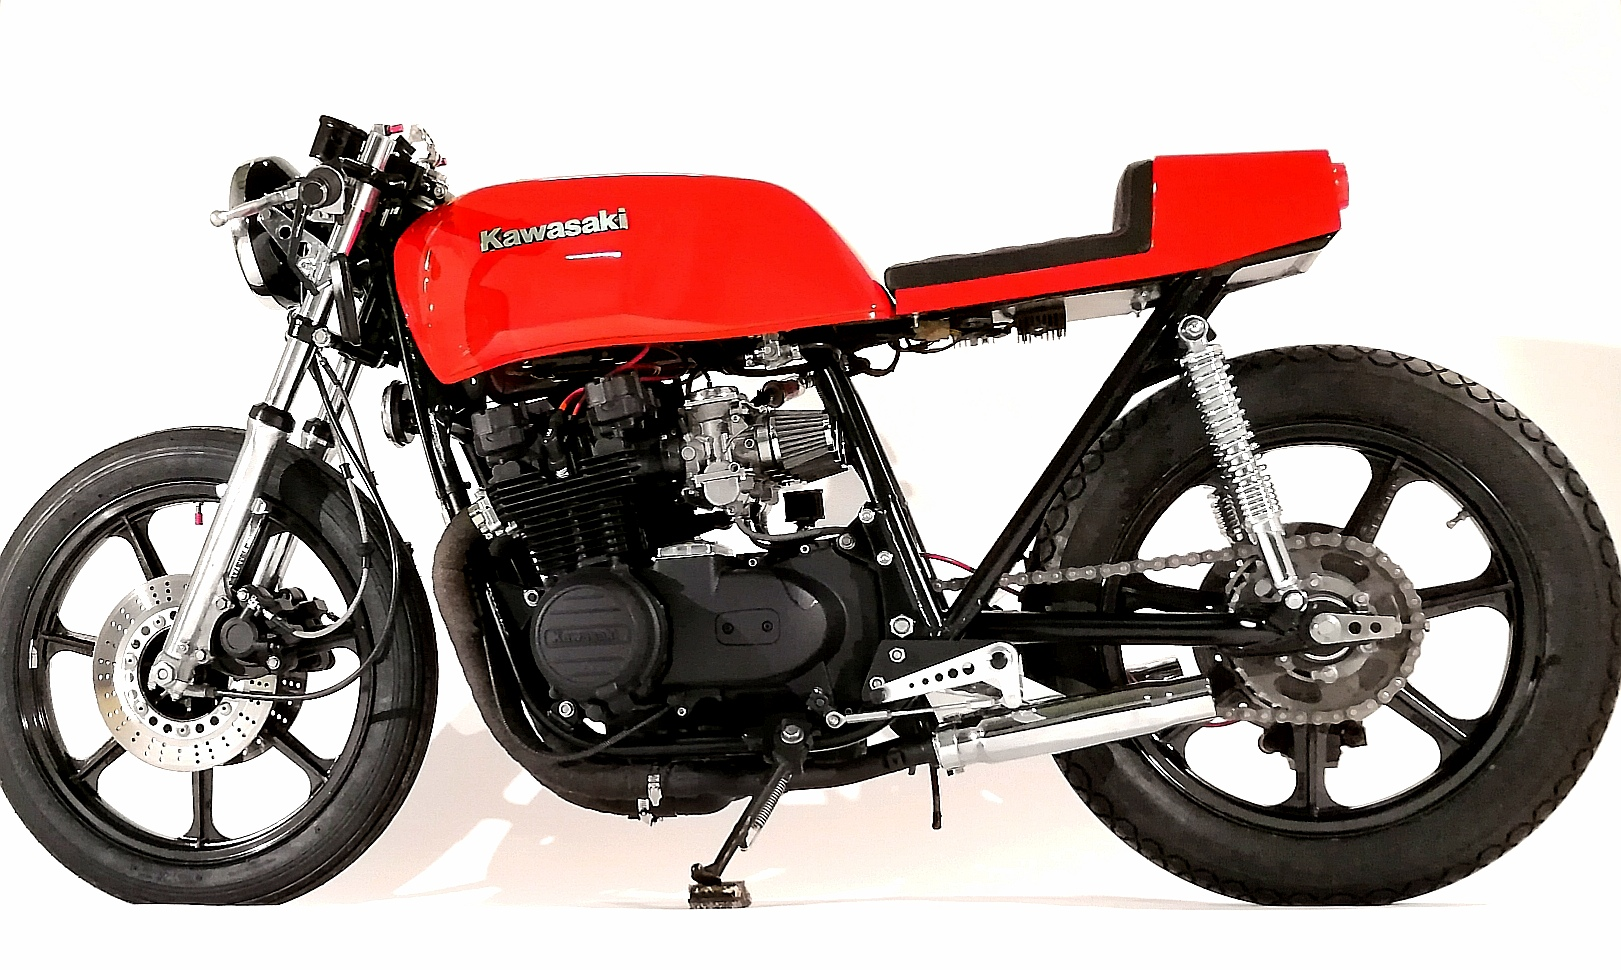 Kawasaki custom Cafe Racer 17machines